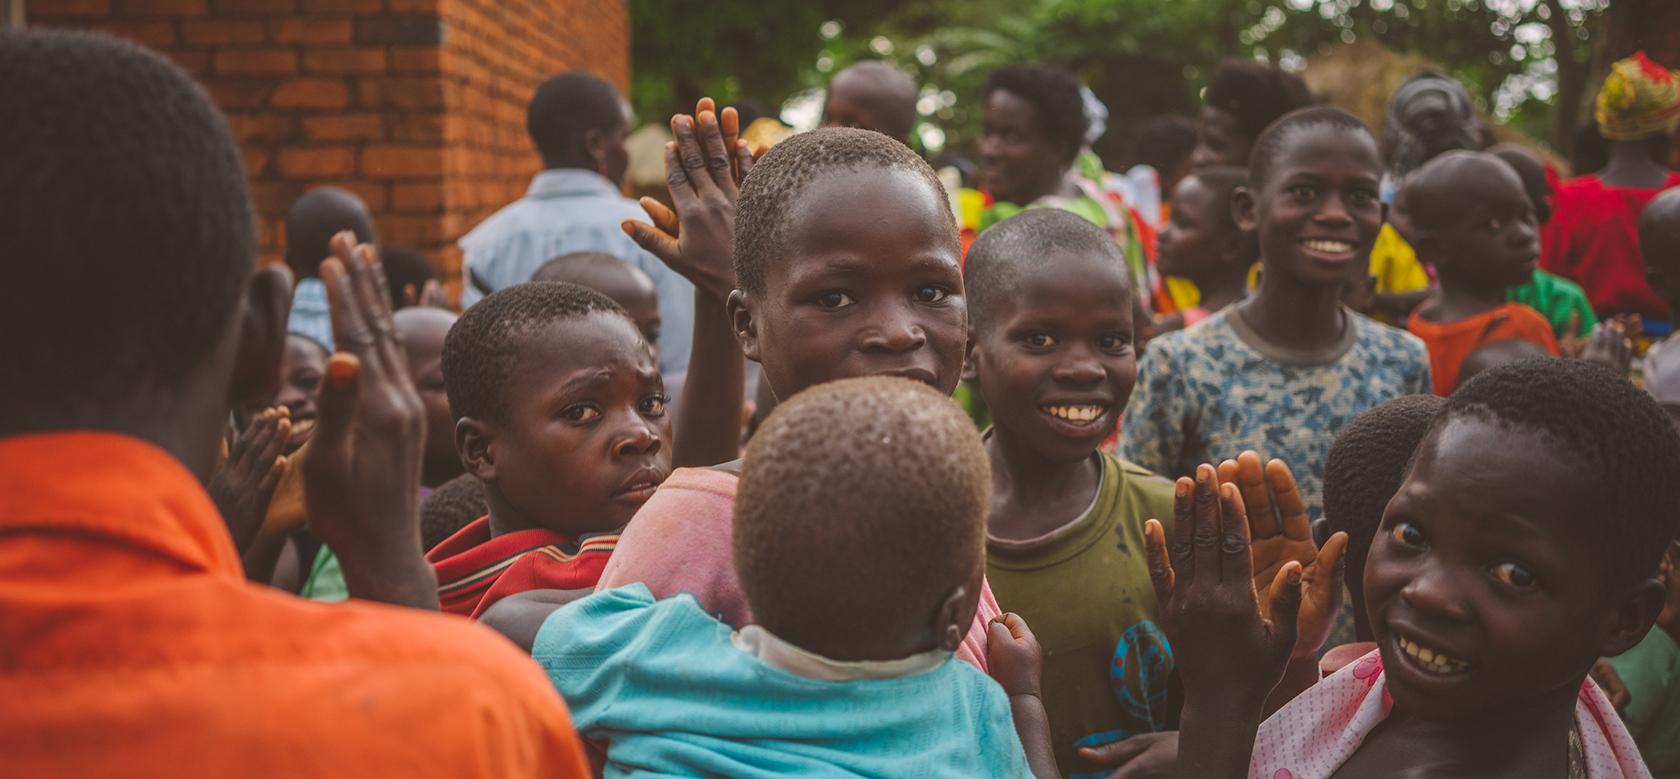 Charity Effectiveness